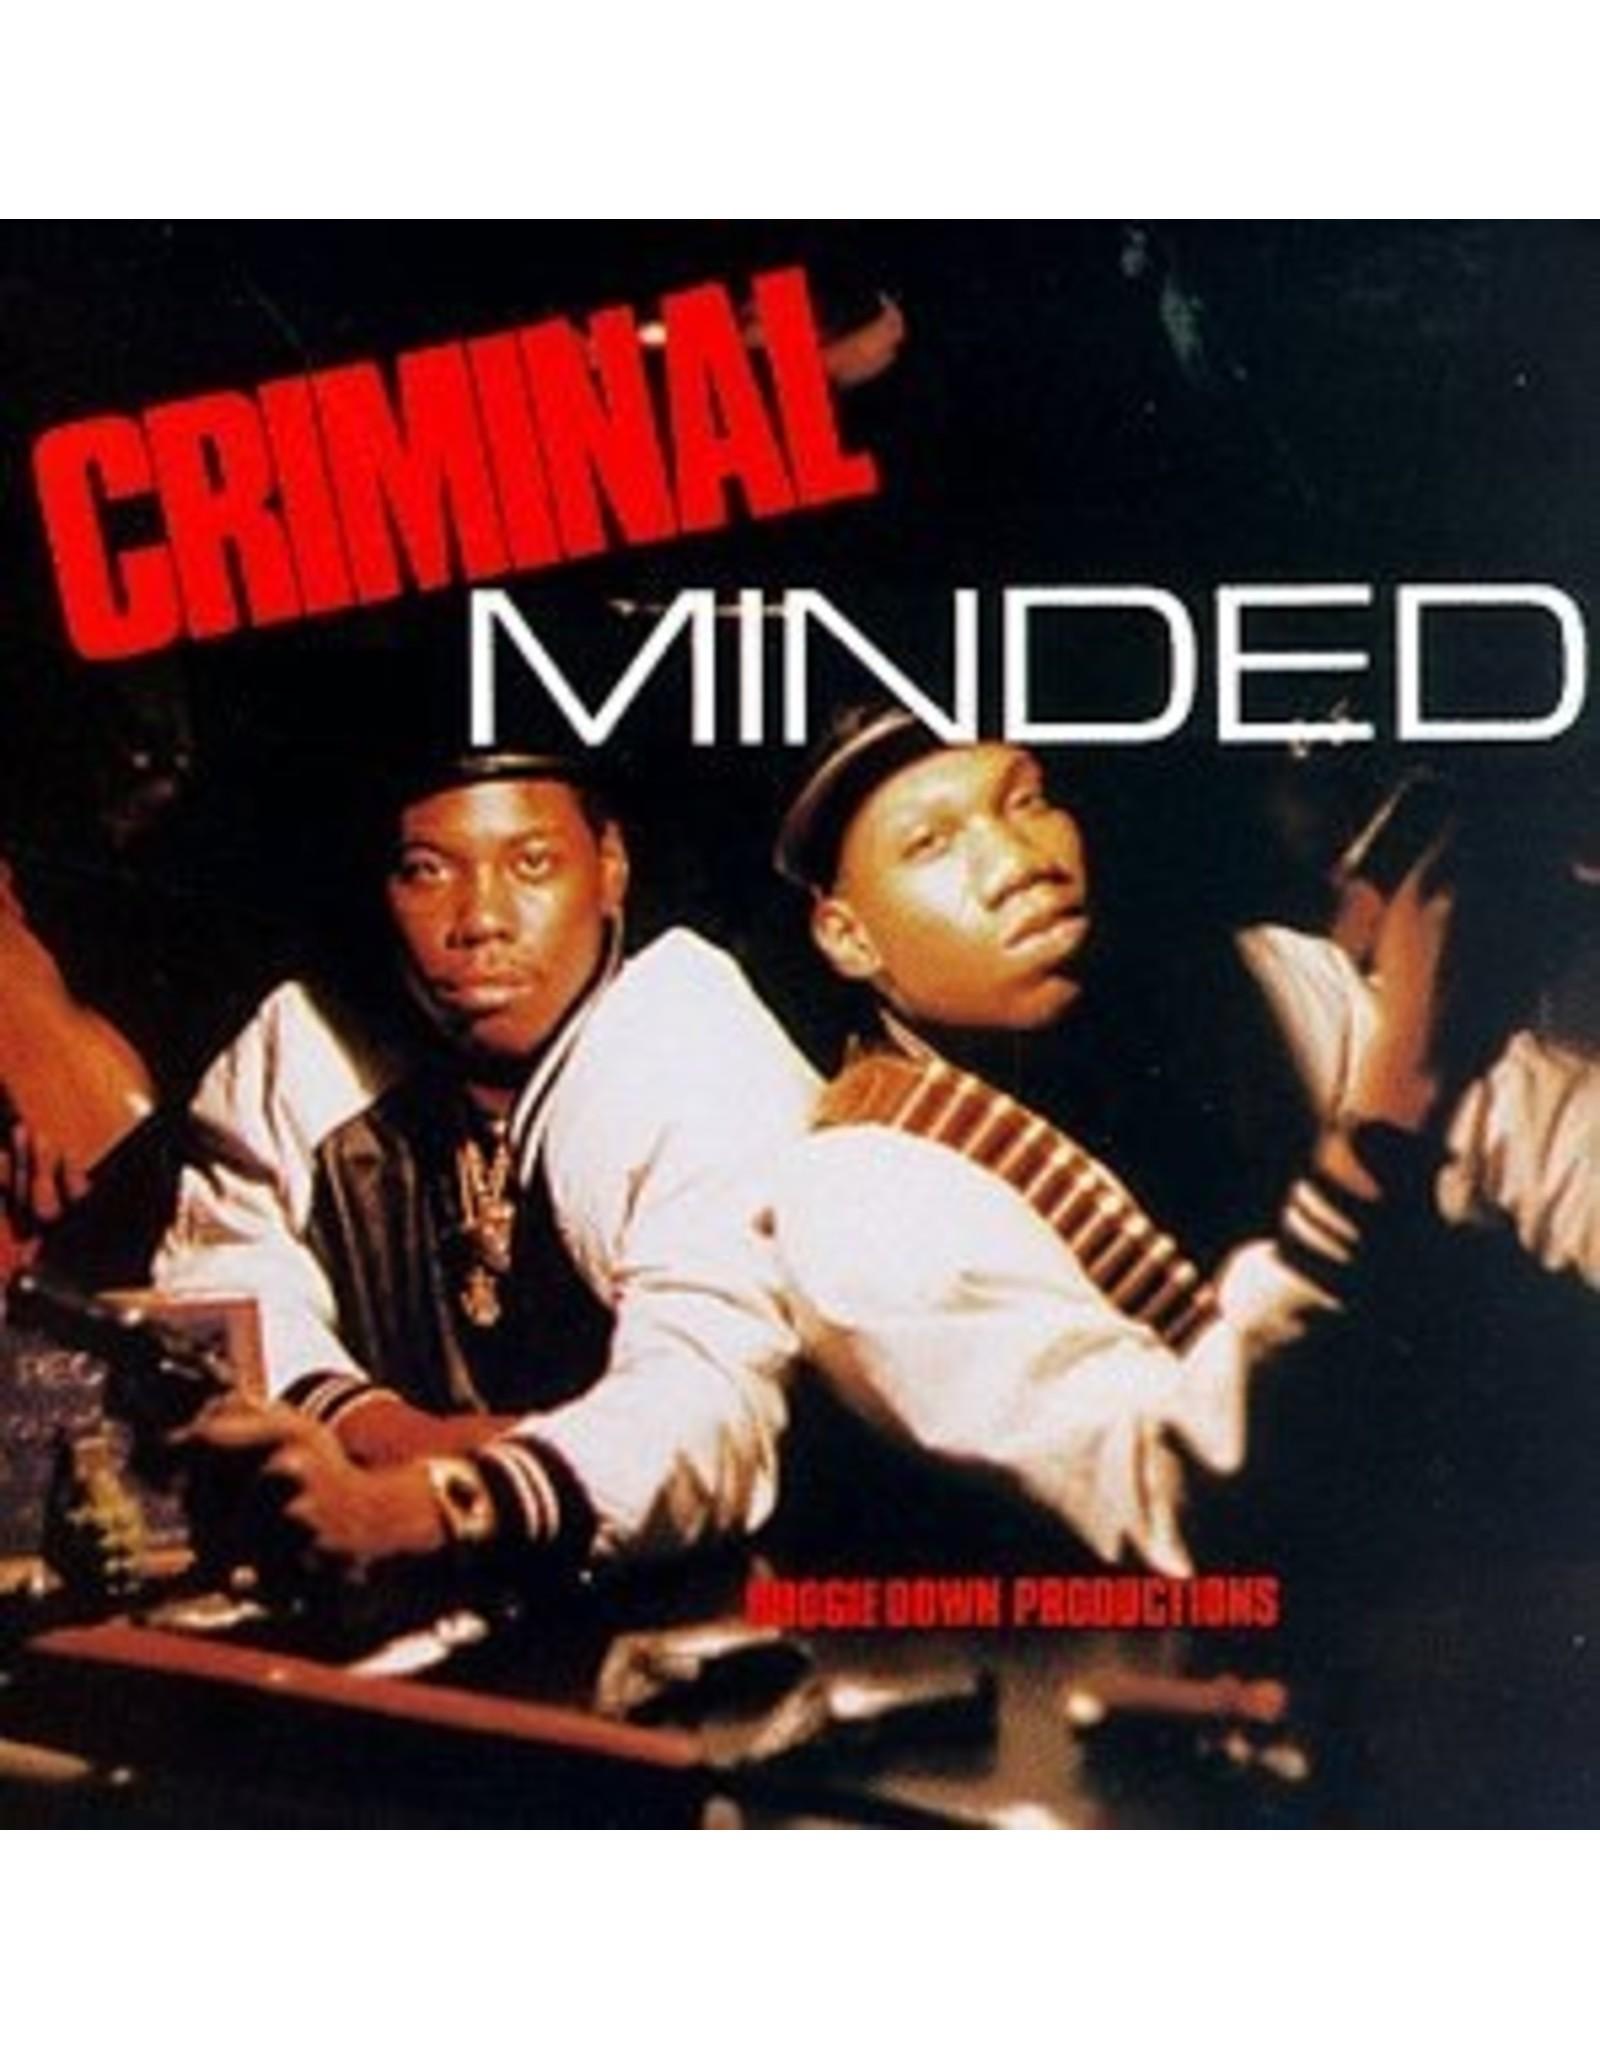 New Vinyl Boogie Down Productions - Criminal Minded 2LP